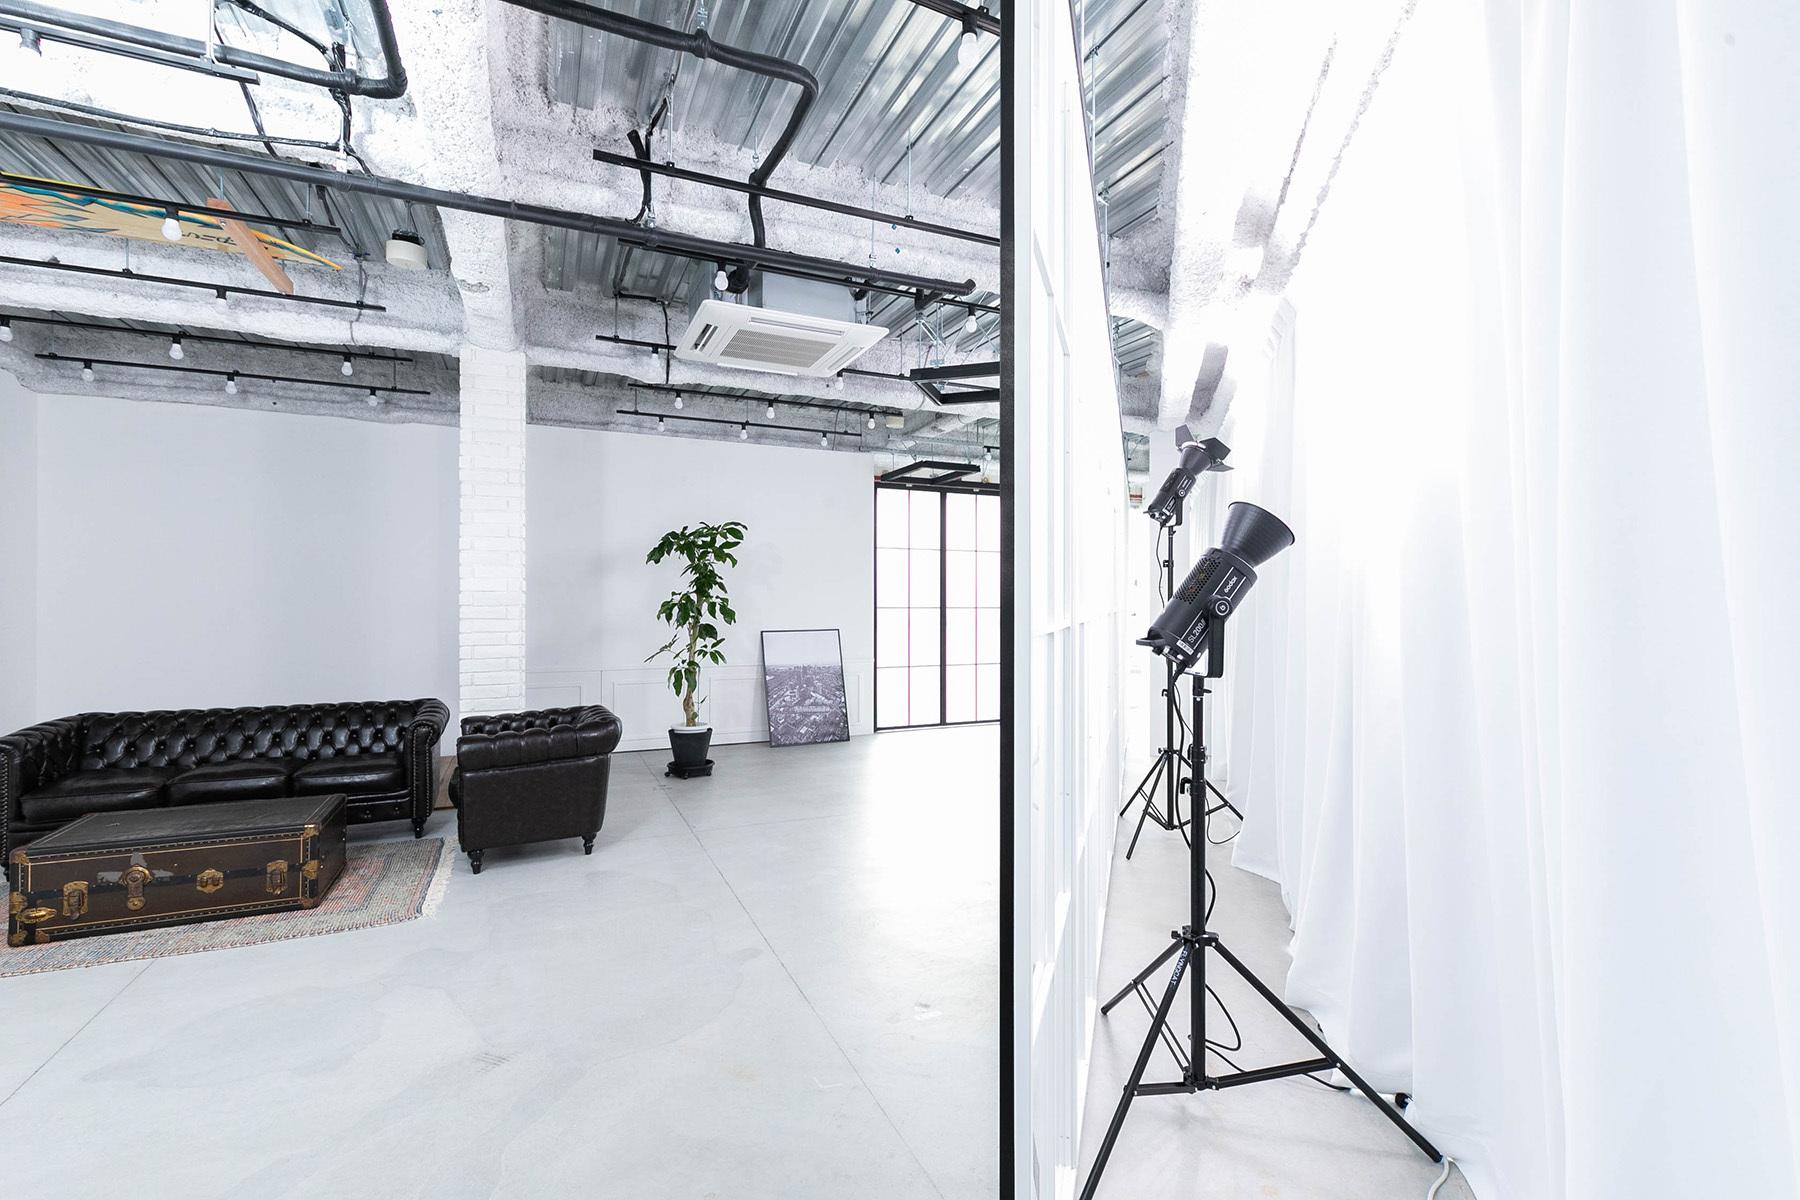 STUDIO FLYINGCAT (スタジオ フライングキャット)大型モニターなど撮影補助ツール